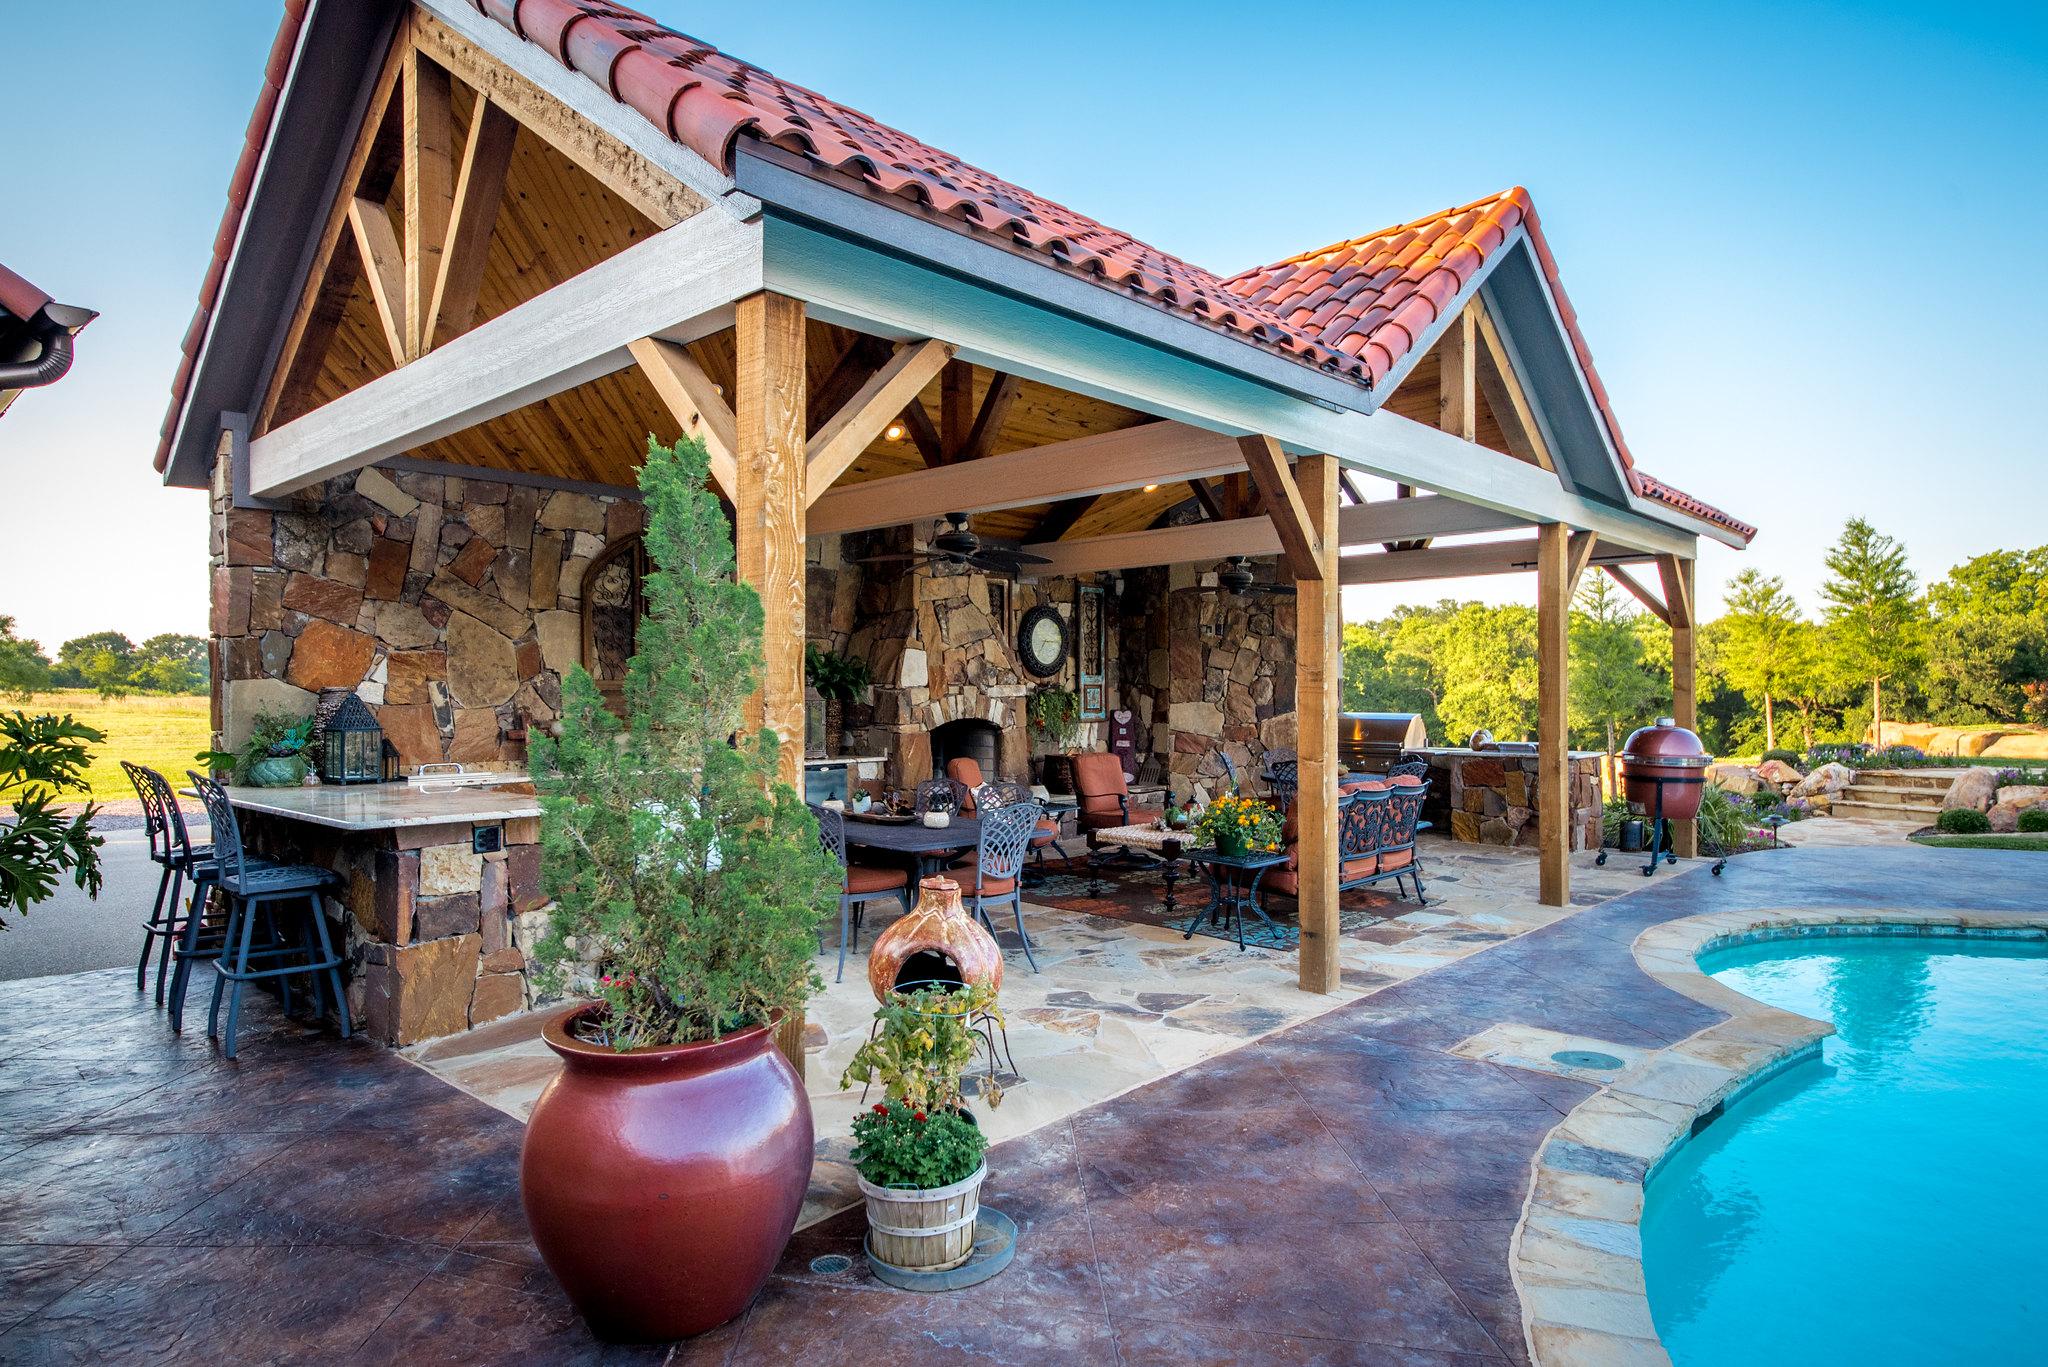 Southern Outdoor Living - Allison Landscpe & Pool Company on Southern Pools And Outdoor Living  id=77339